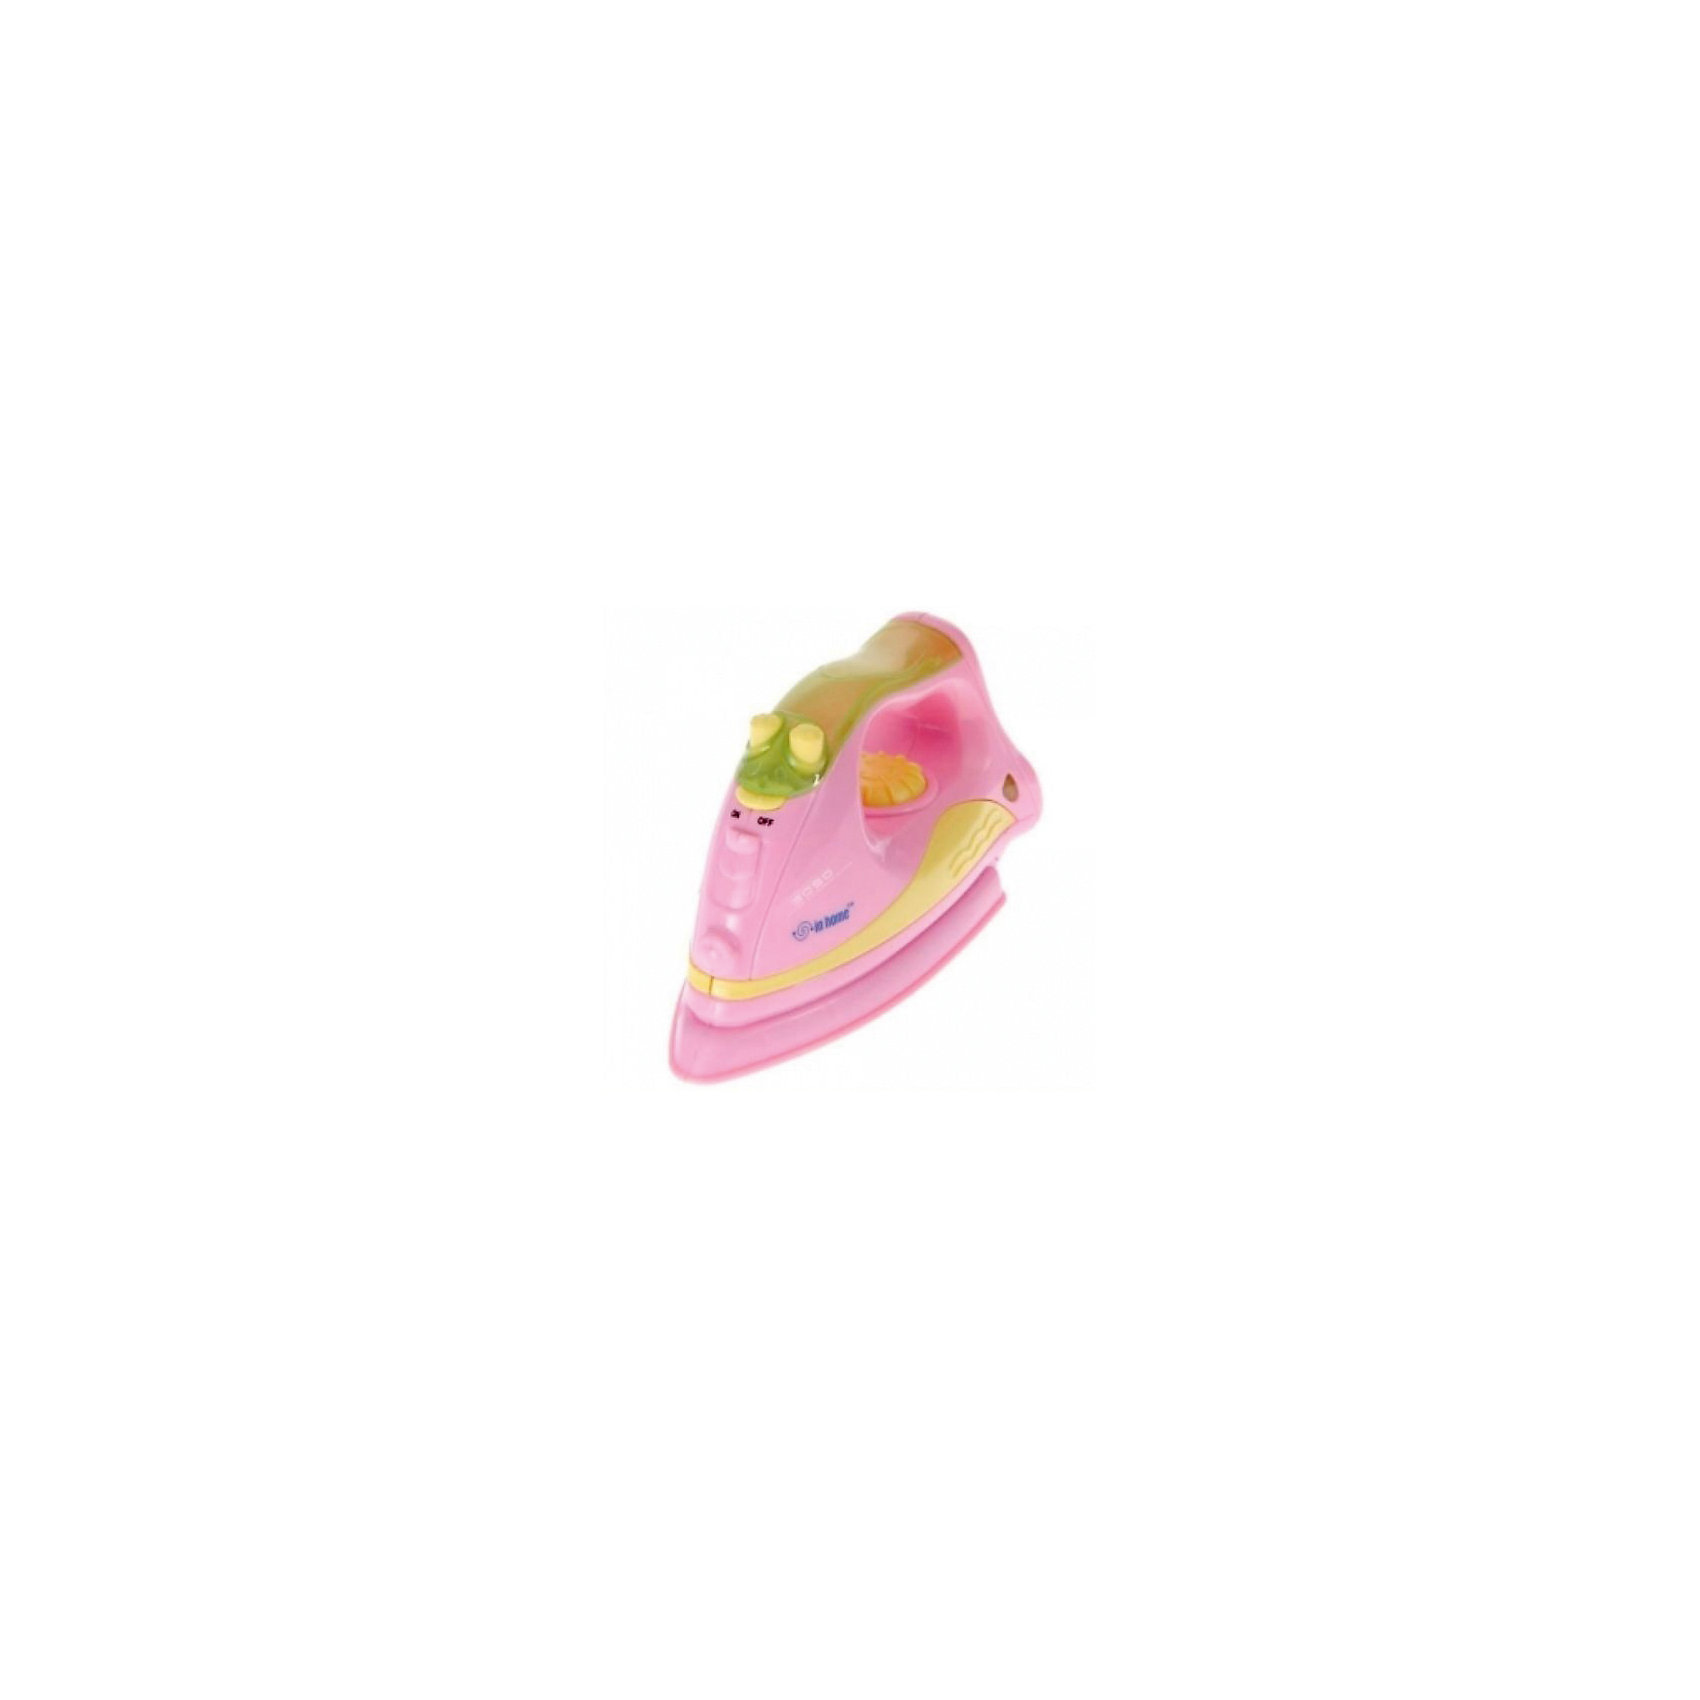 - Утюг детский, розовый, Red Box